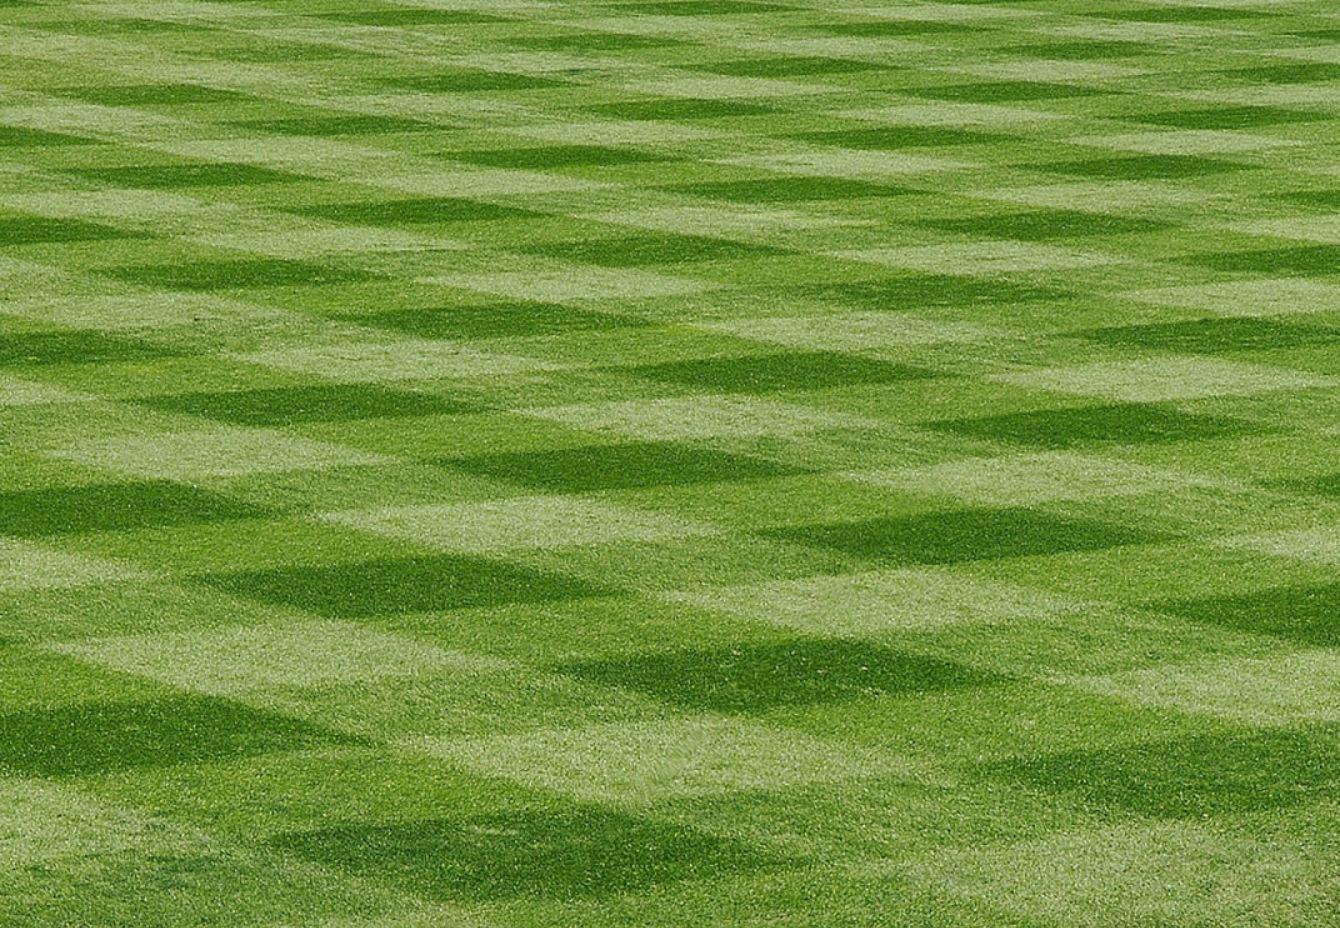 Baseball Field Backgrounds 1340x928